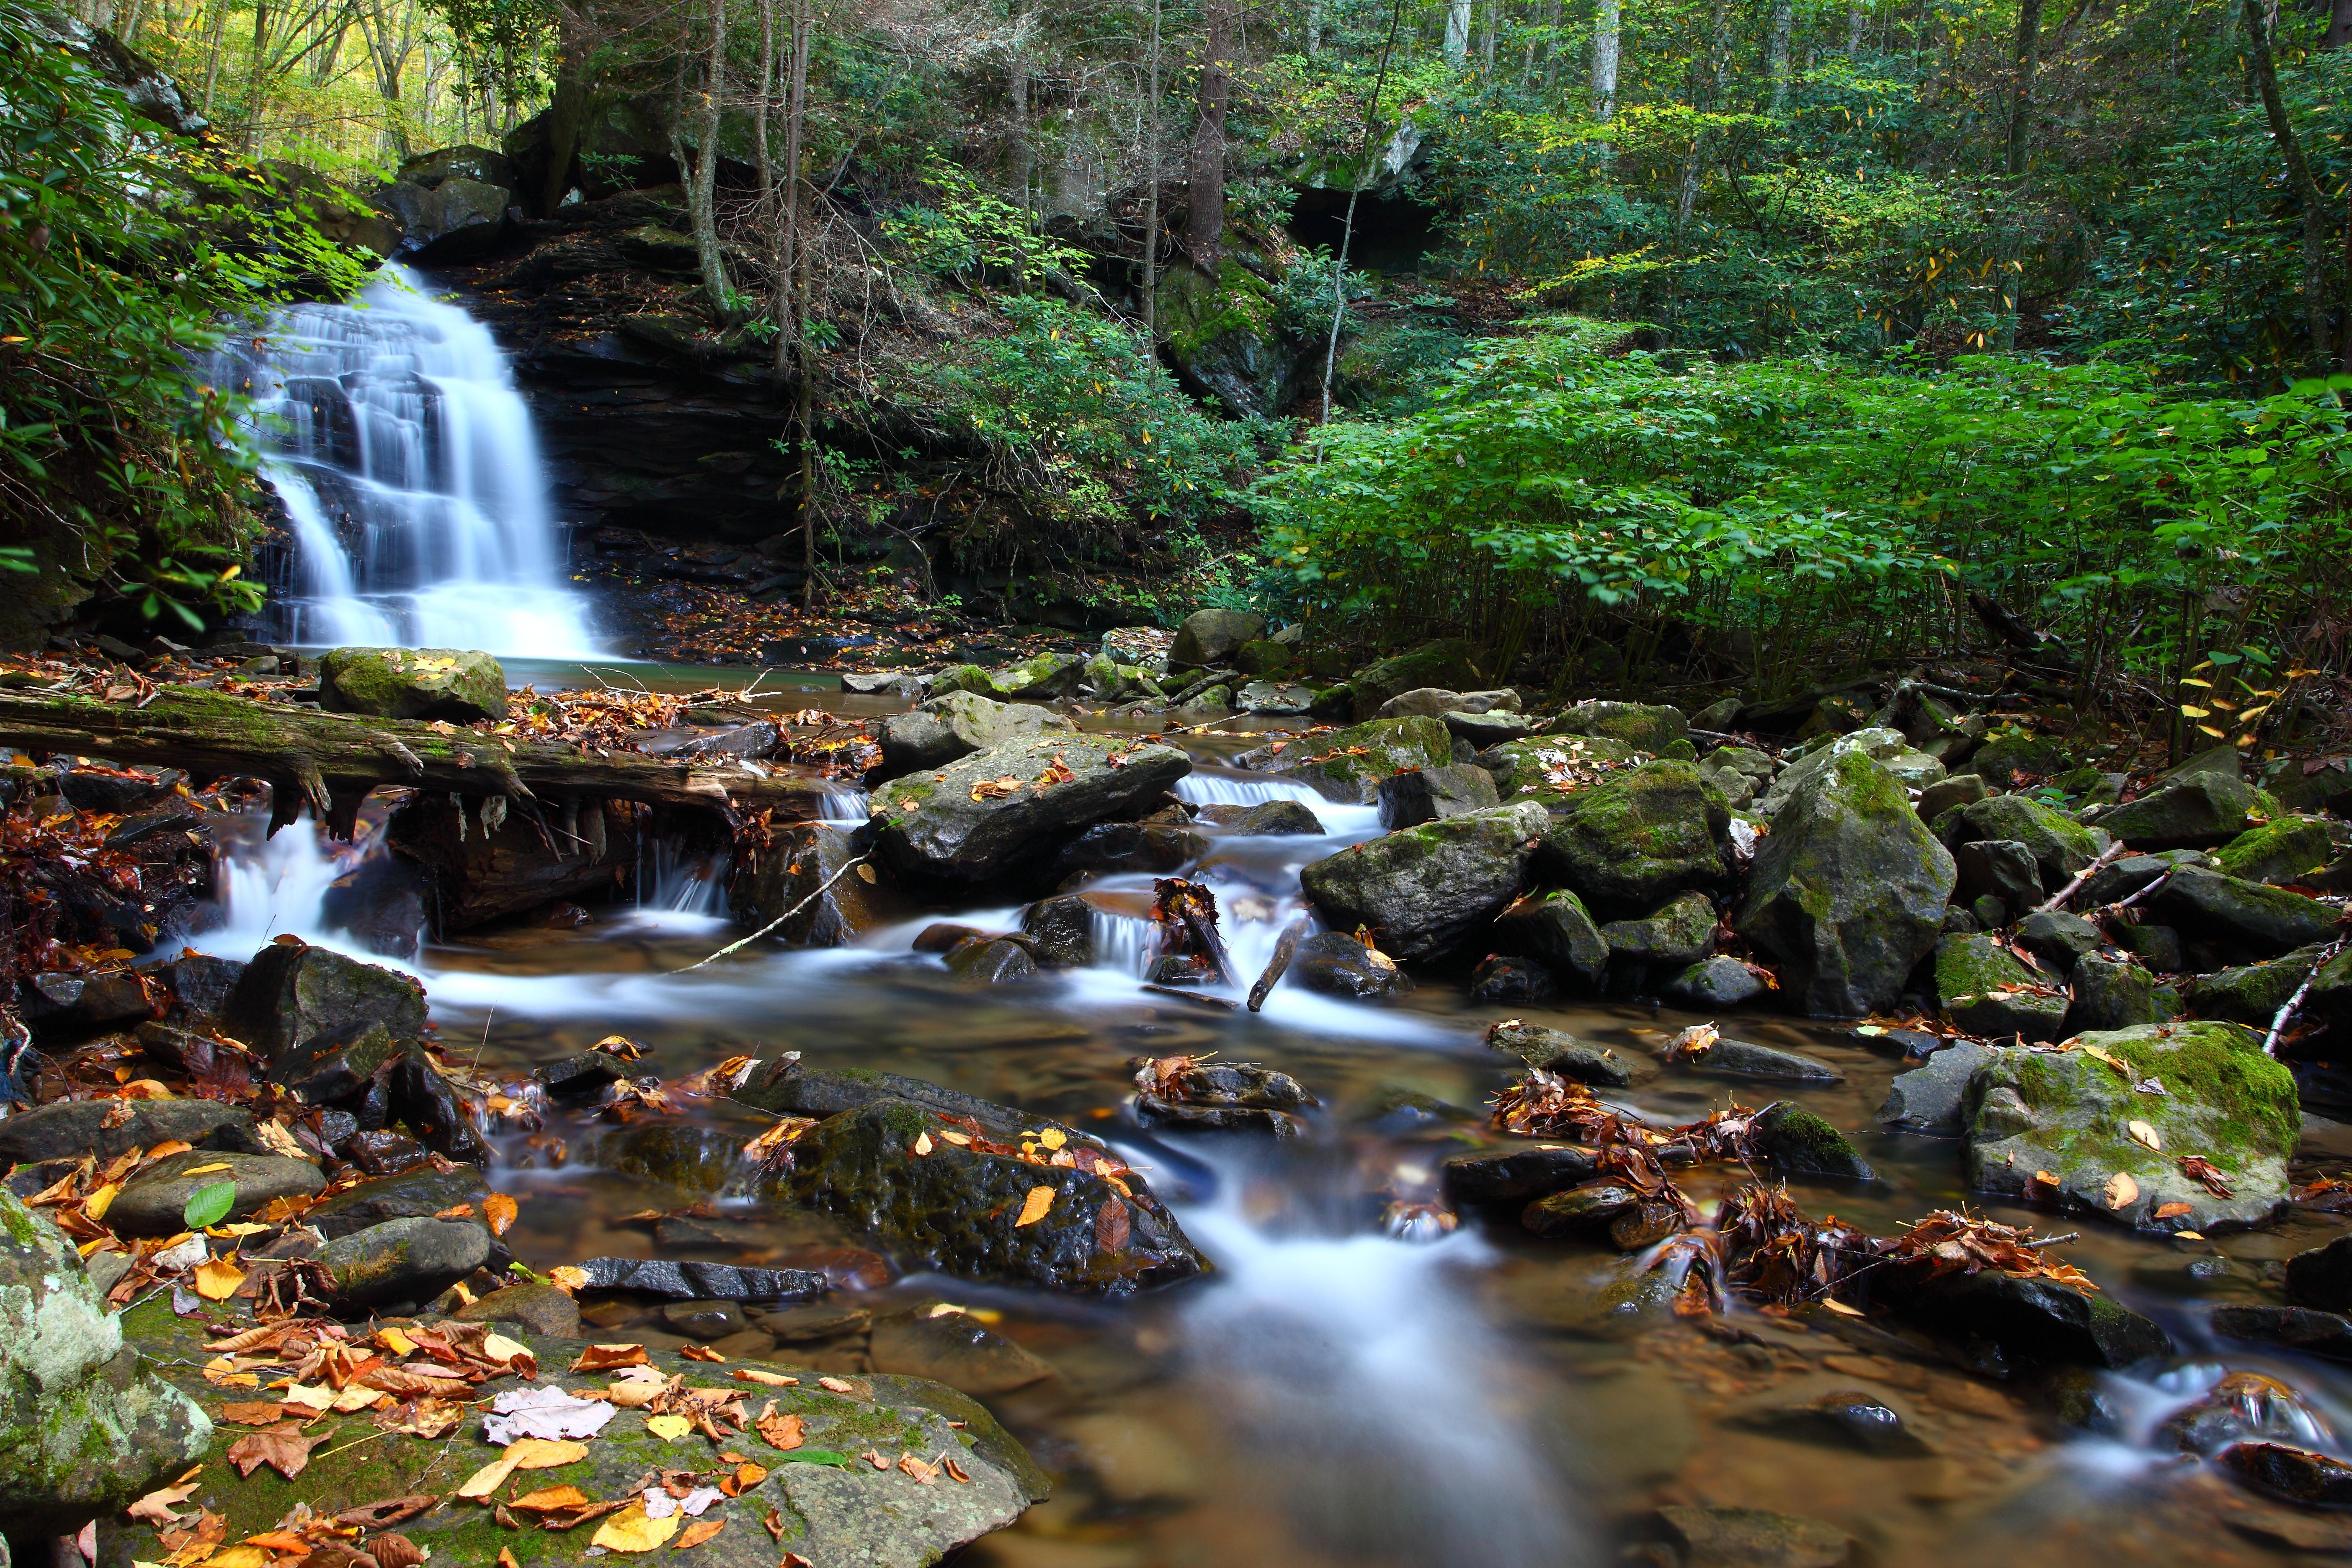 https://upload.wikimedia.org/wikipedia/commons/9/9a/Autumn-creek-waterfalls-leaves_-_West_Virginia_-_ForestWander.jpg